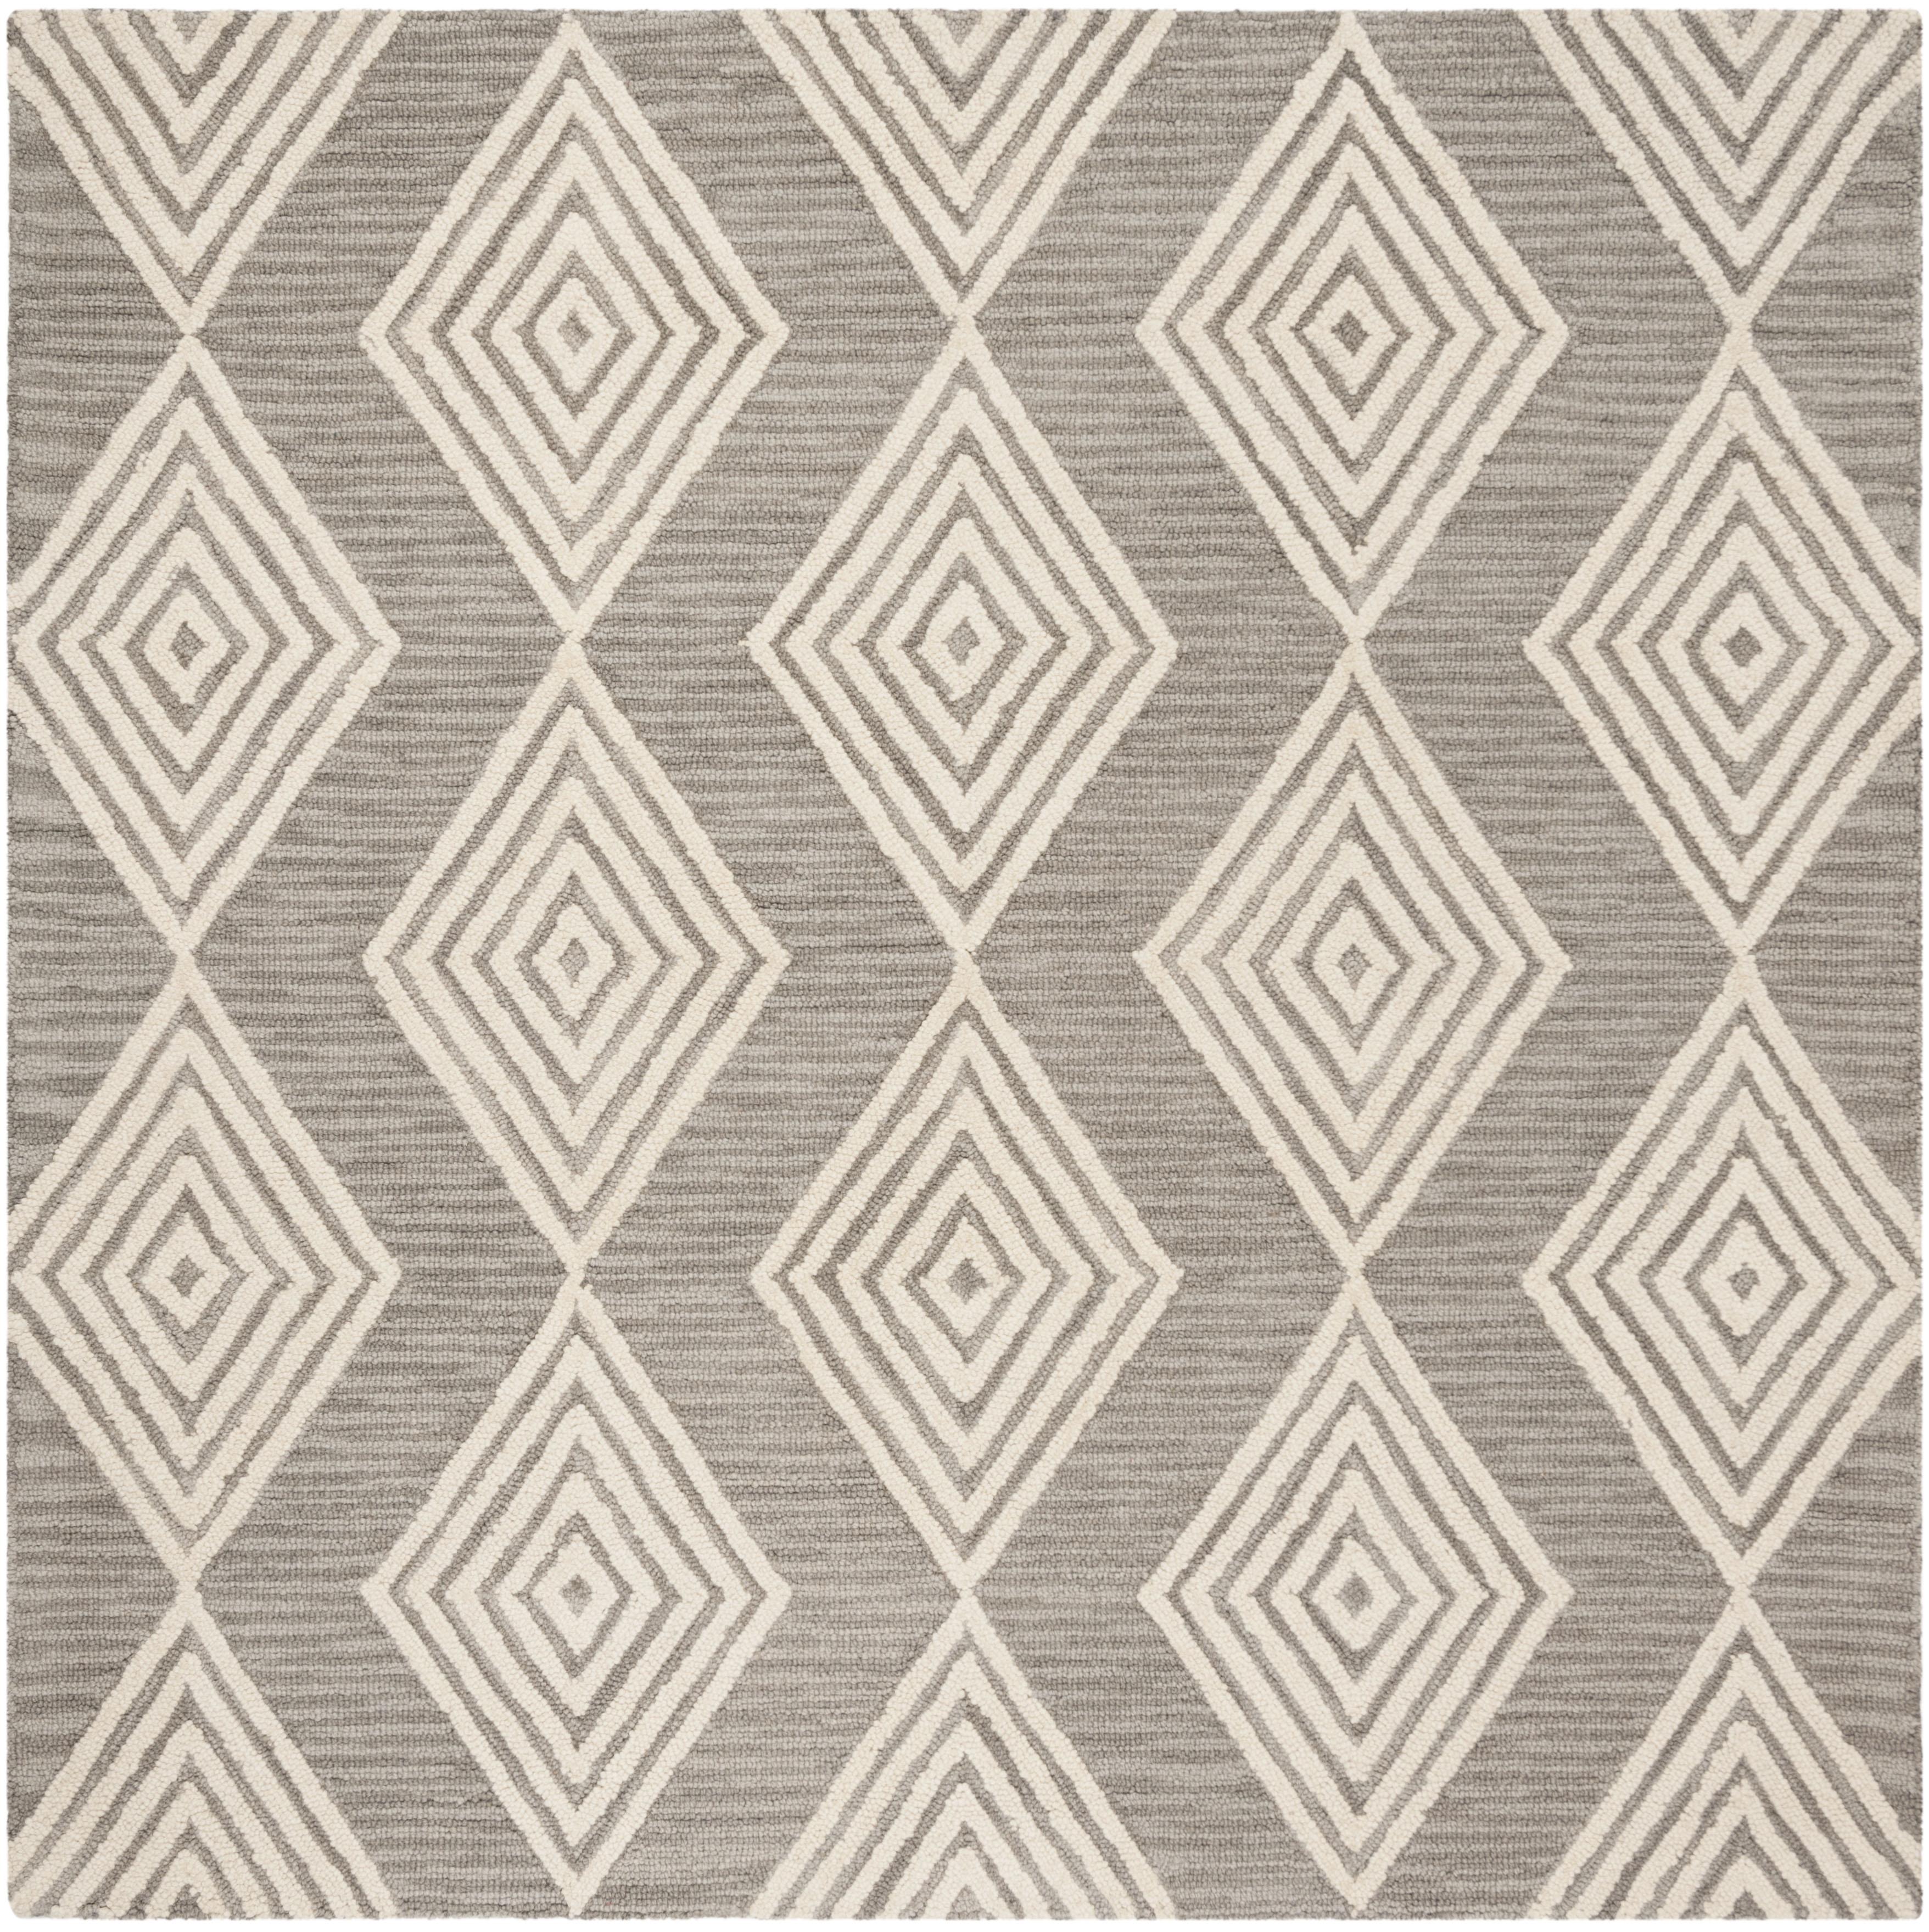 Morgan 111 6' X 6' Square Gray Wool Rug